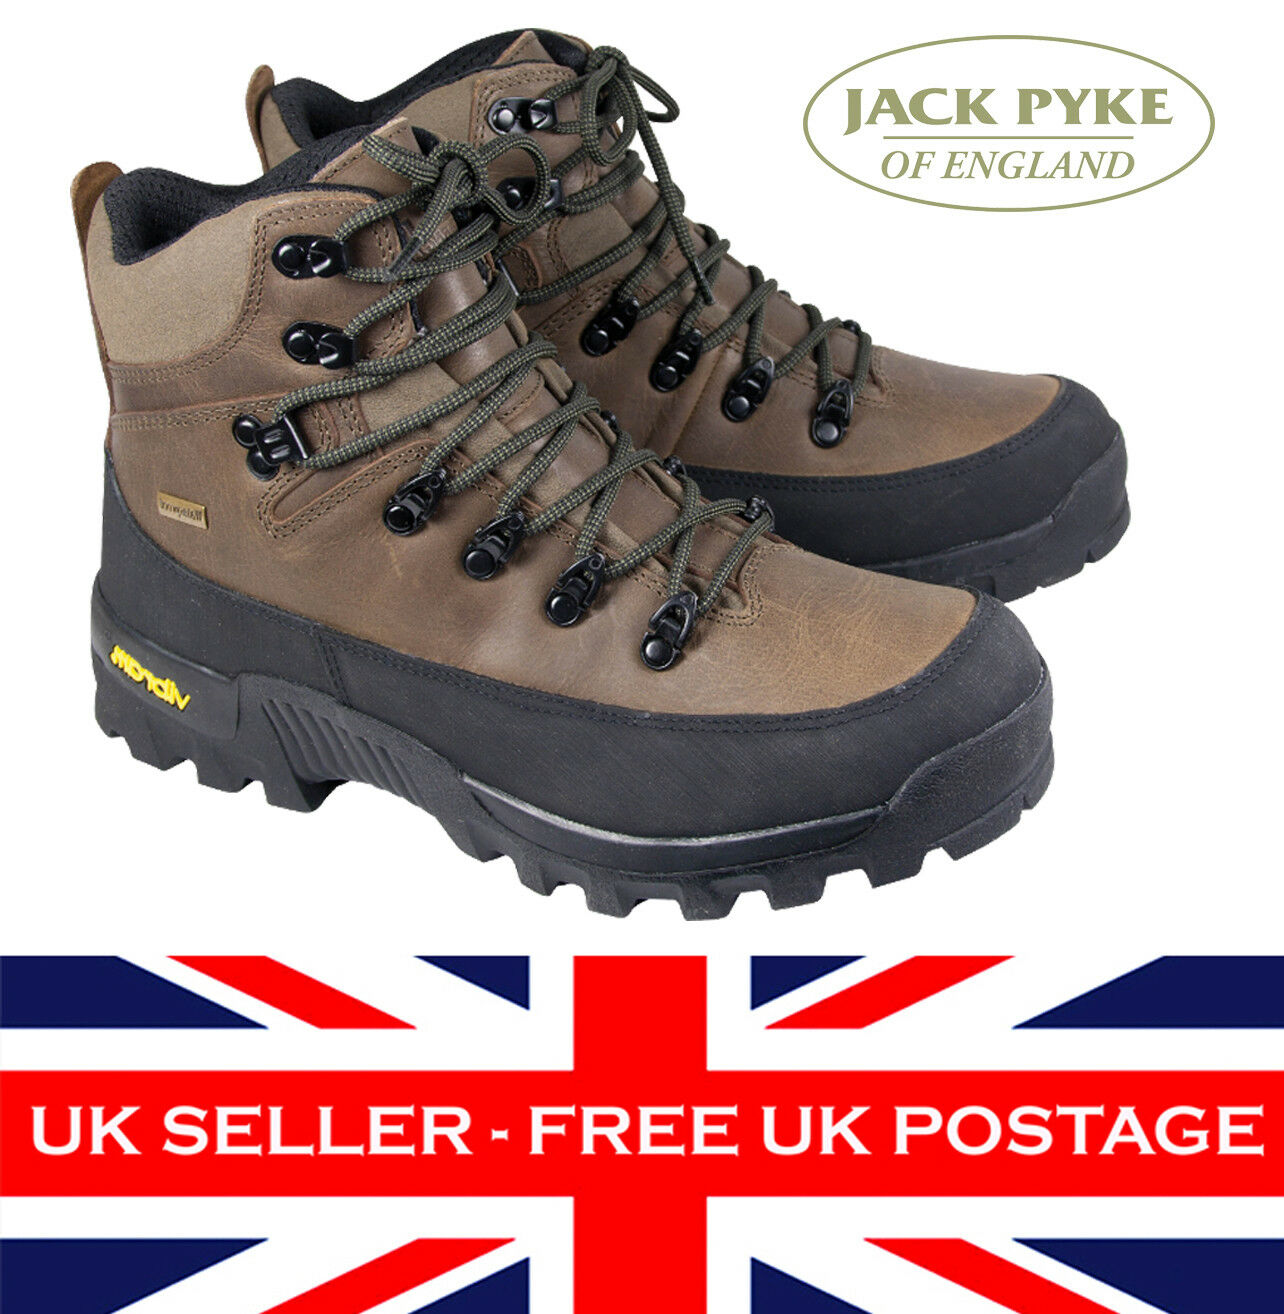 Jack Pyke Fieldman Leather Stiefel Waterproof Thinsulate Hunting Shooting Vibram